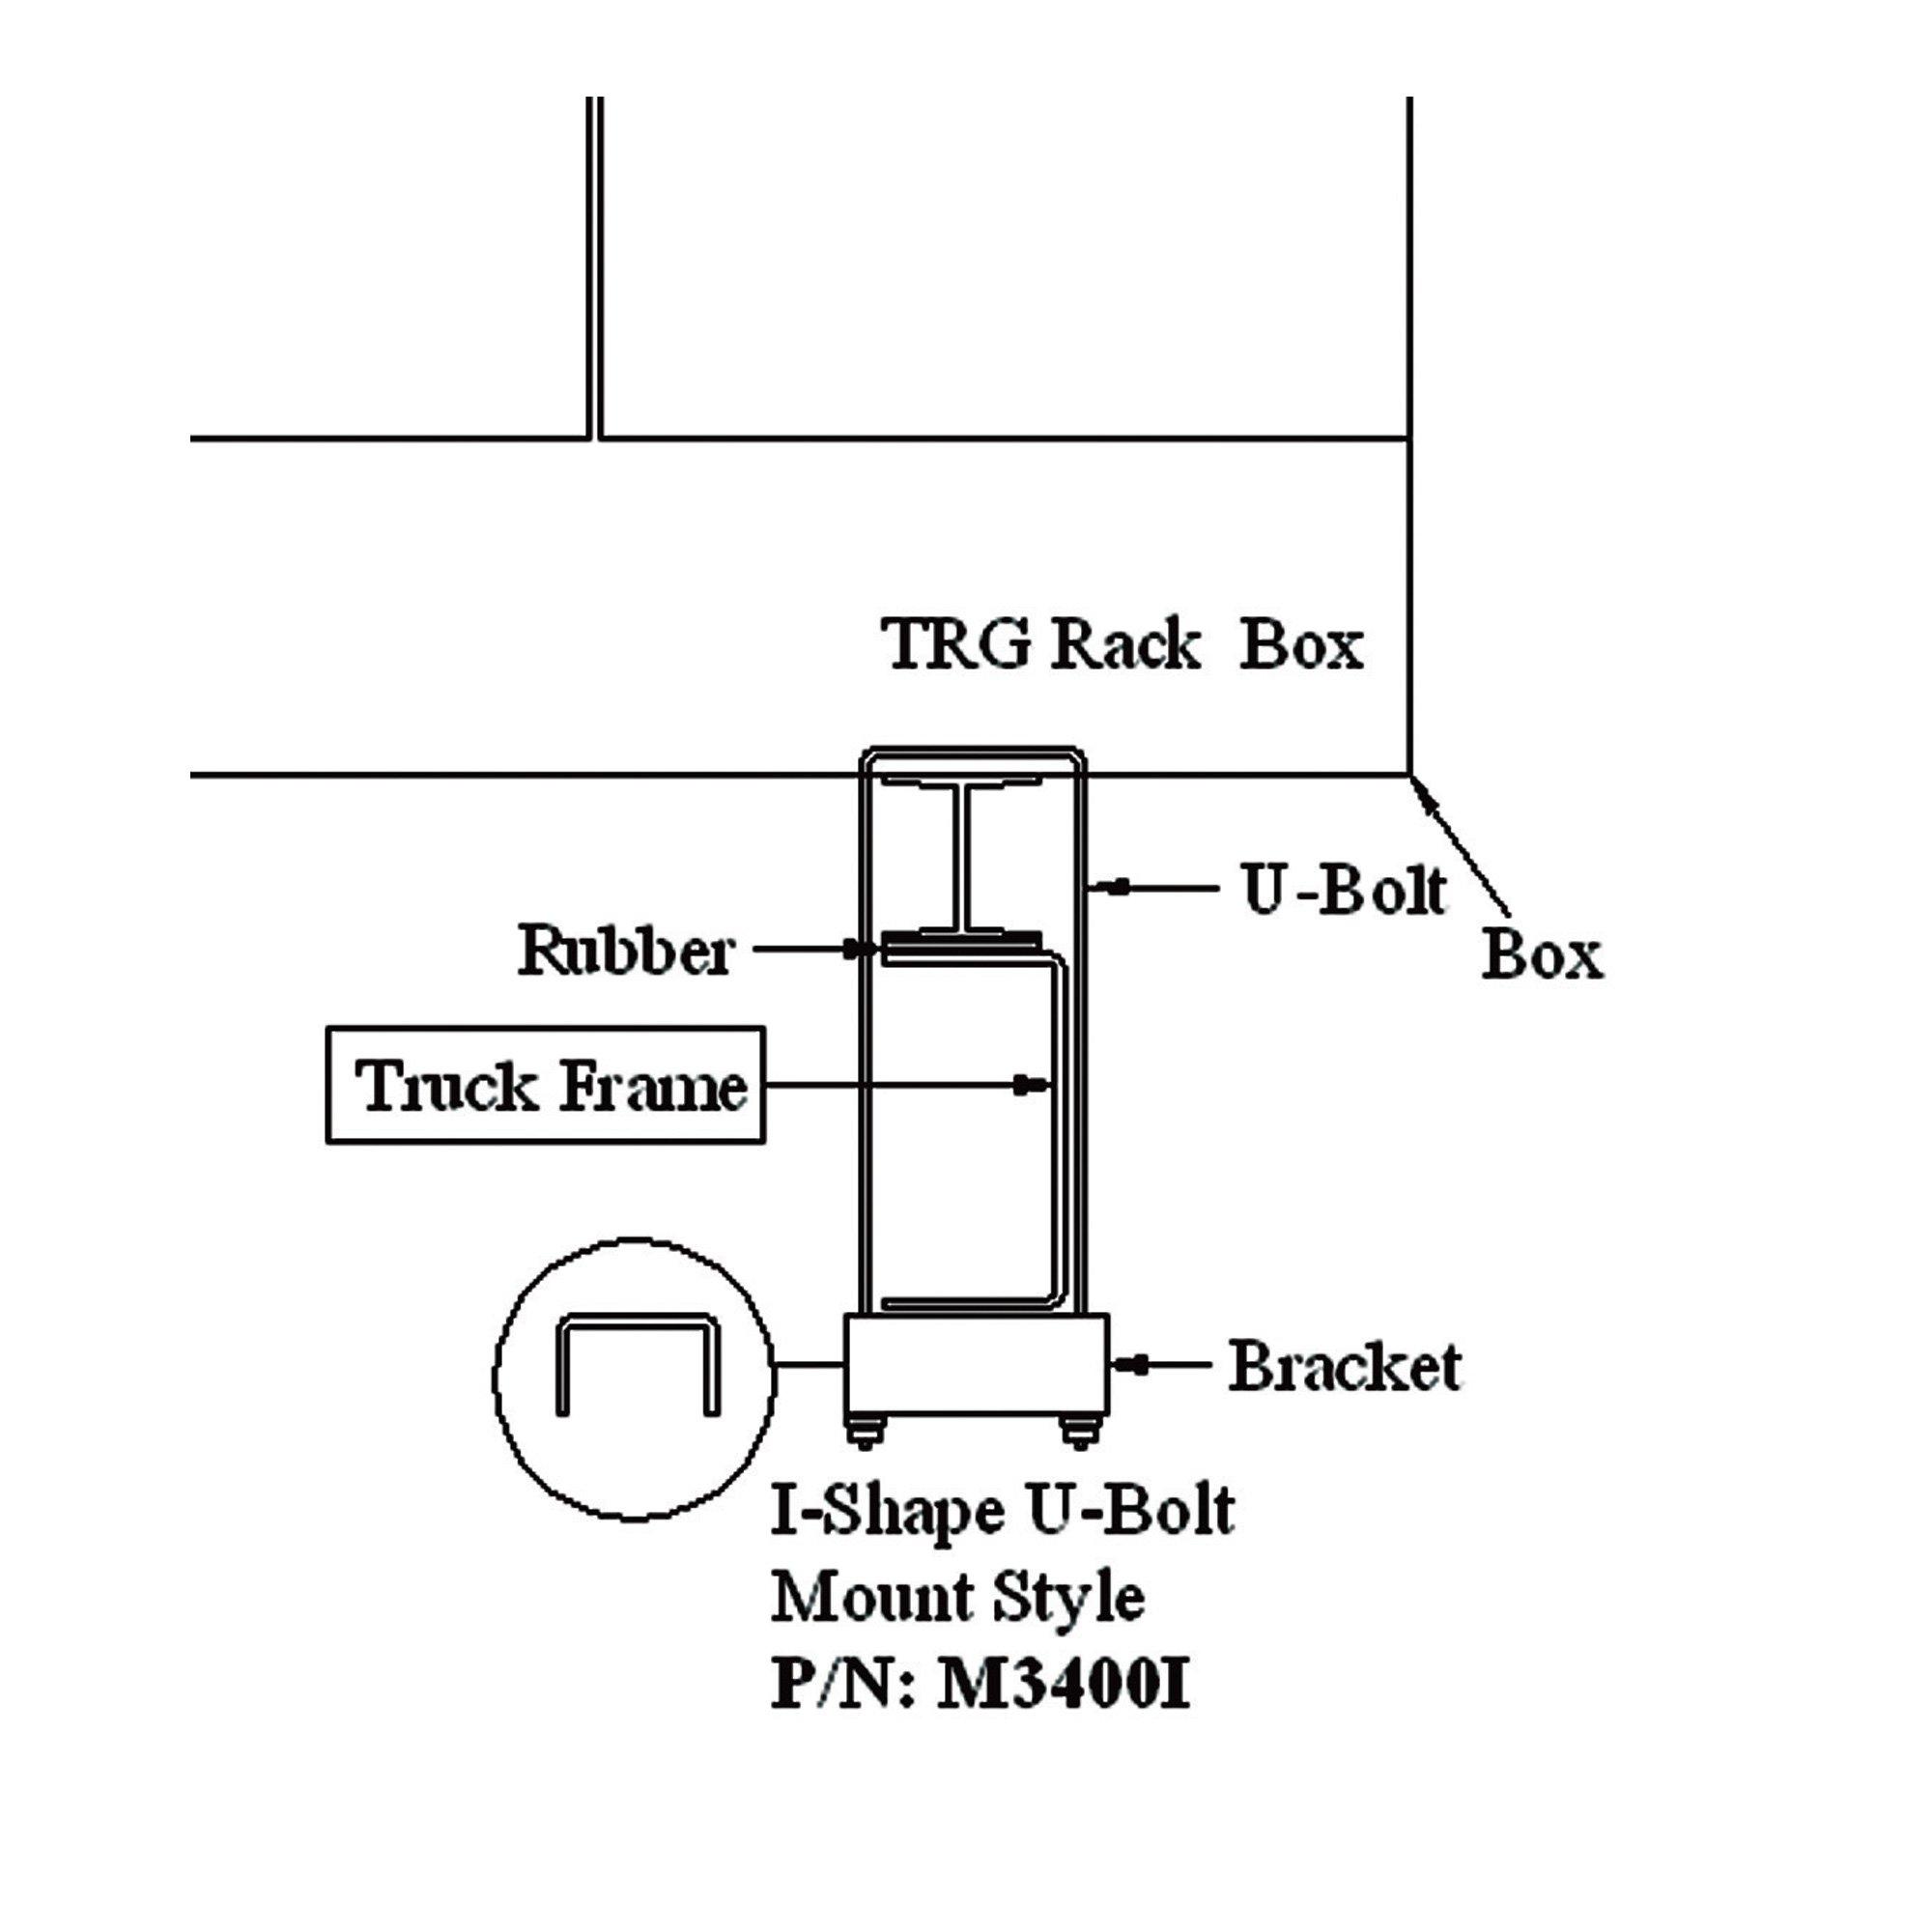 American Truckboxes U-Bolt Mounting Kit for Aluminum Rack Box [Misc.]